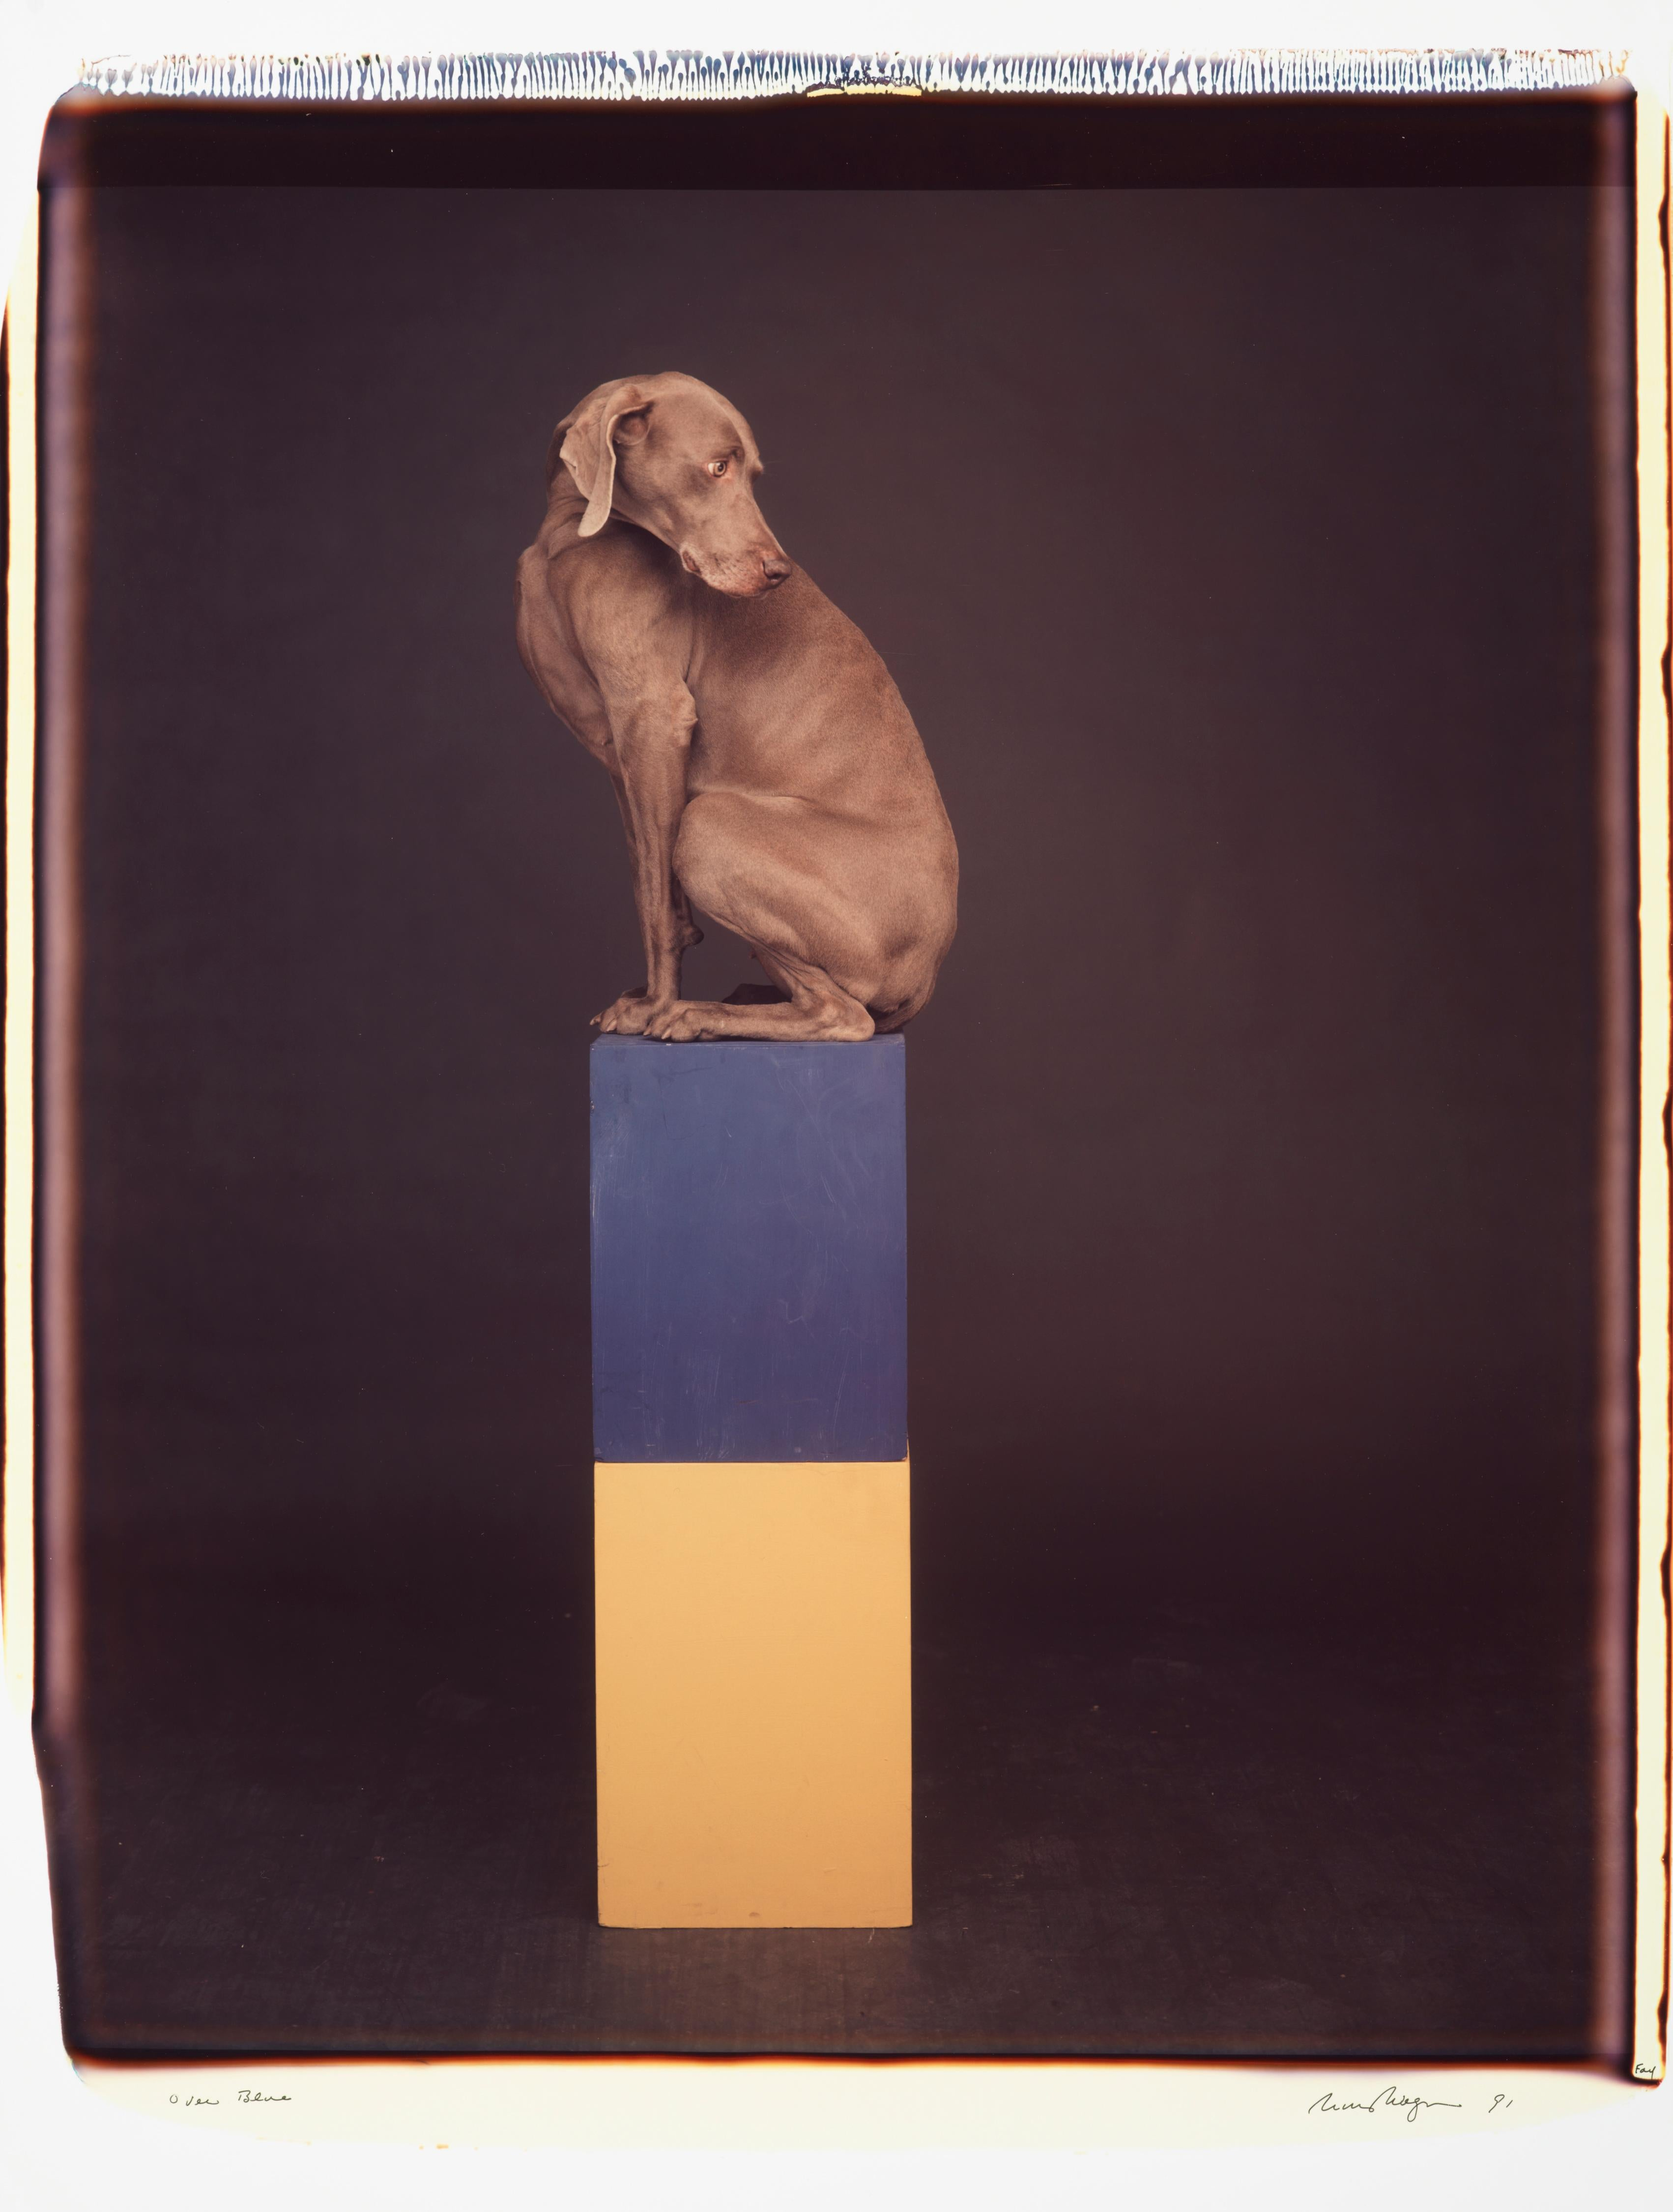 Over Blue - William Wegman (Colour Photography)